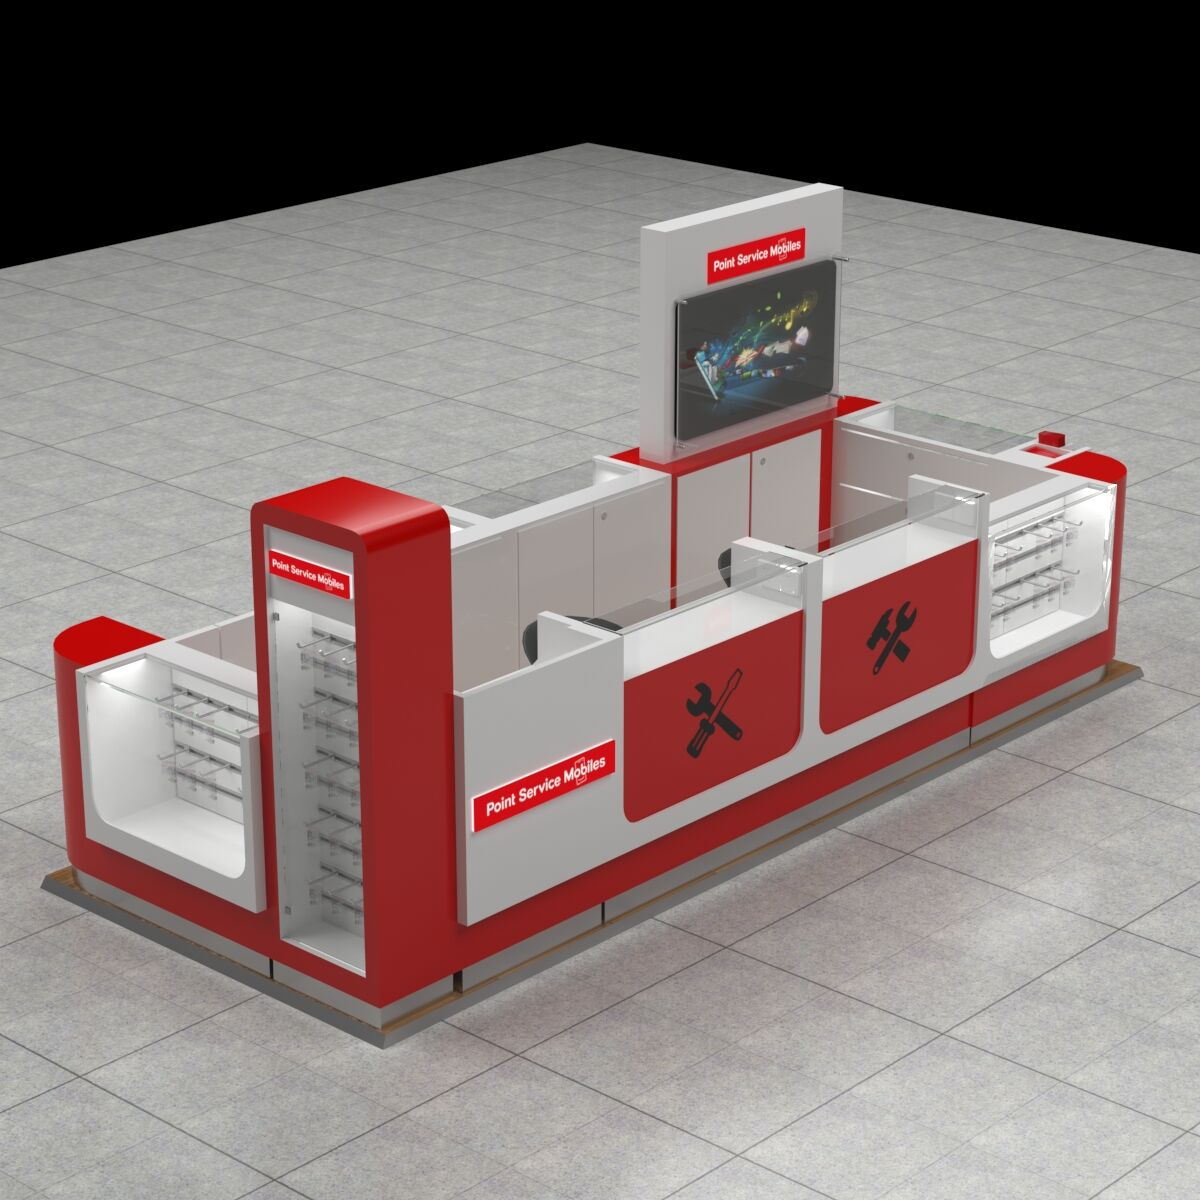 New style cellphone repair kiosk